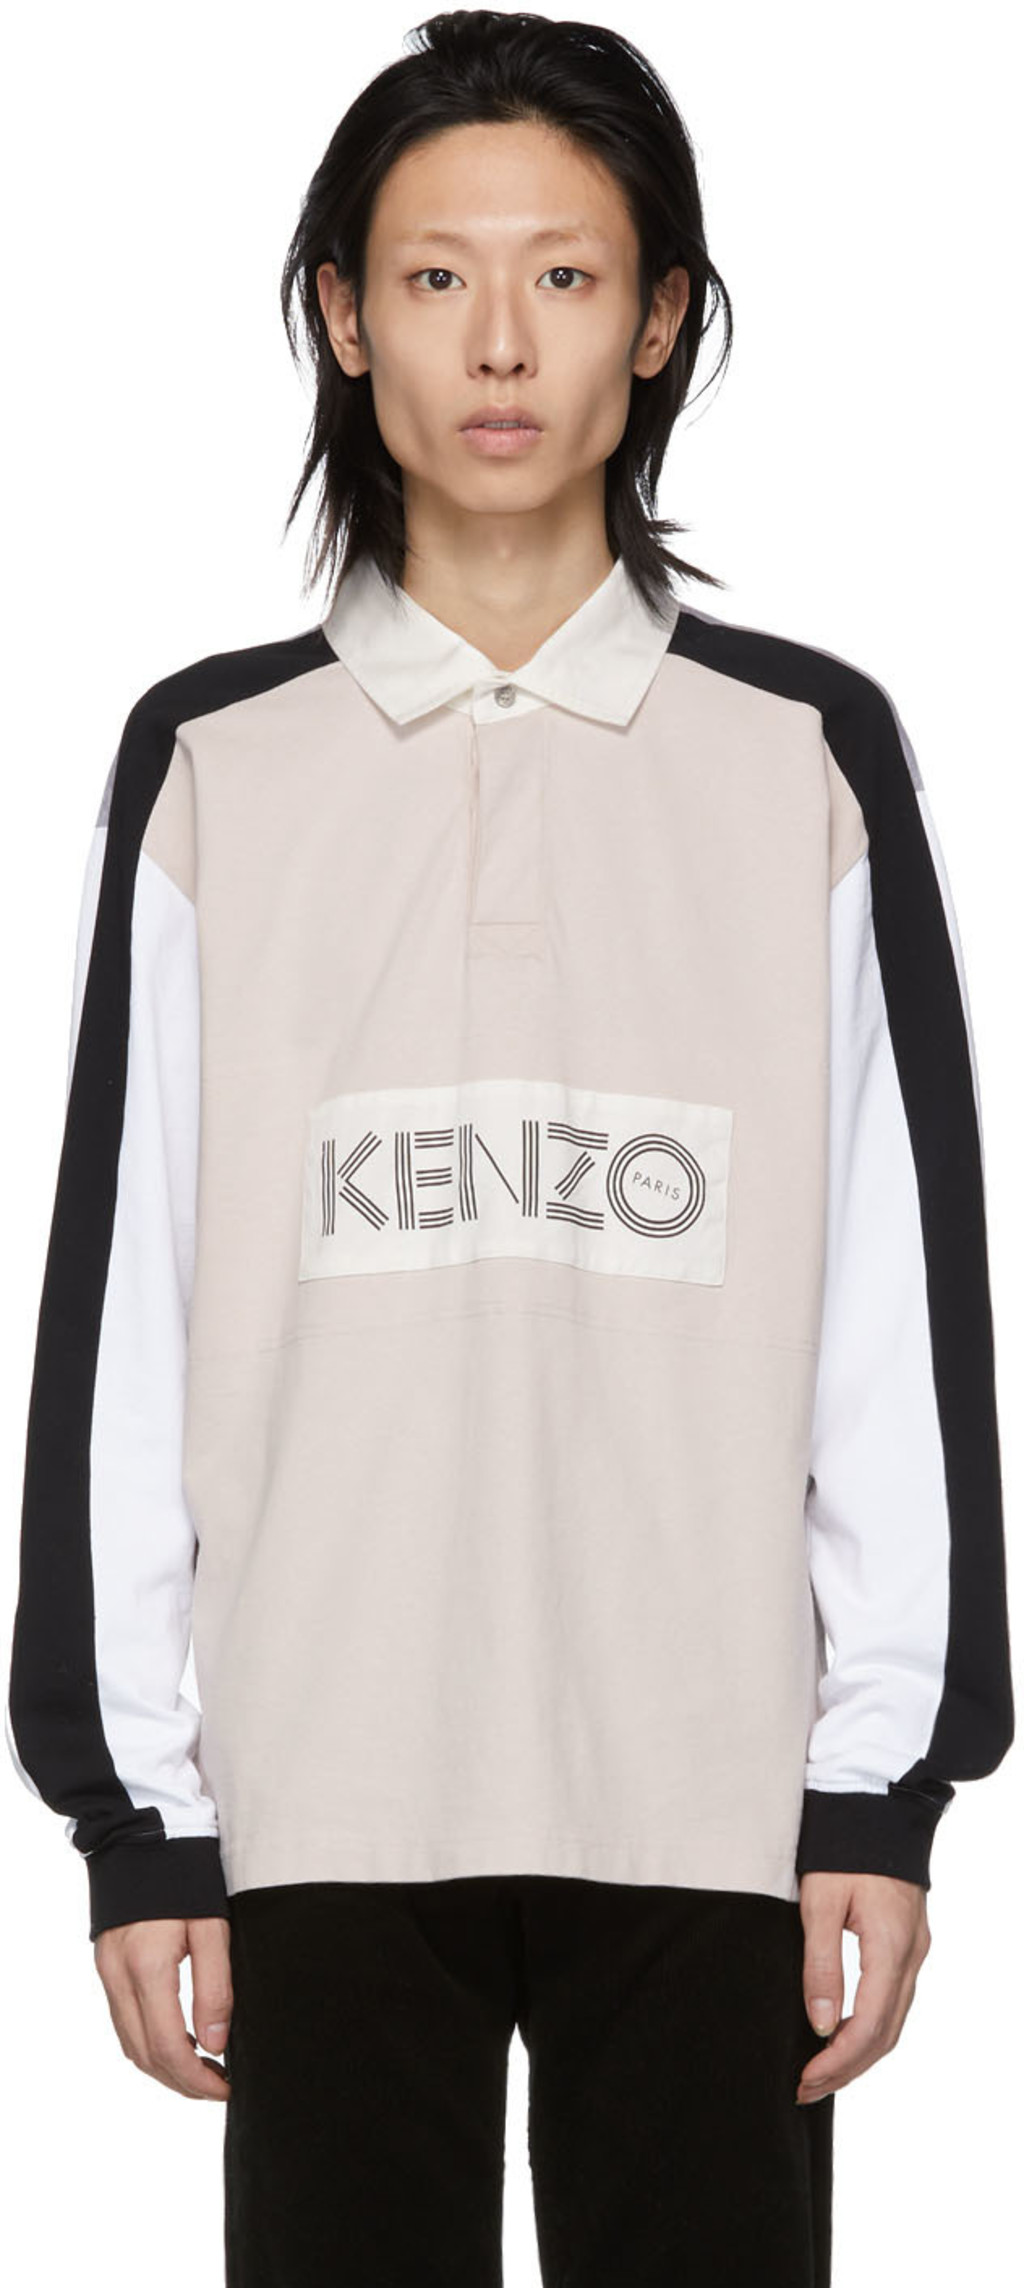 Kenzo Collection pour Hommes   SSENSE France 9cdce3b44d6